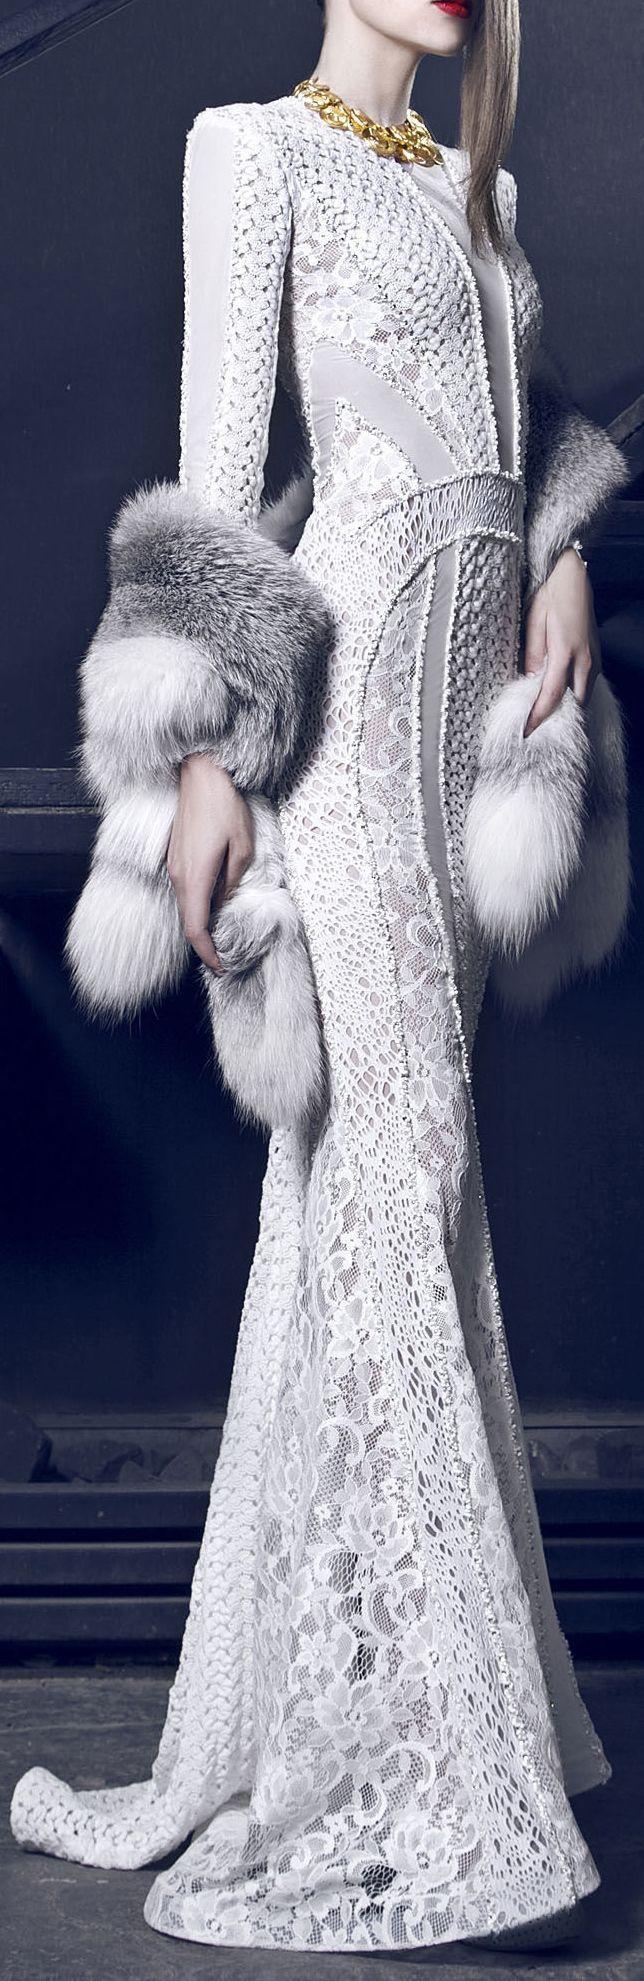 Nicolas Jebran | Fashion - Nicolas Jebran | Pinterest | Traum ...